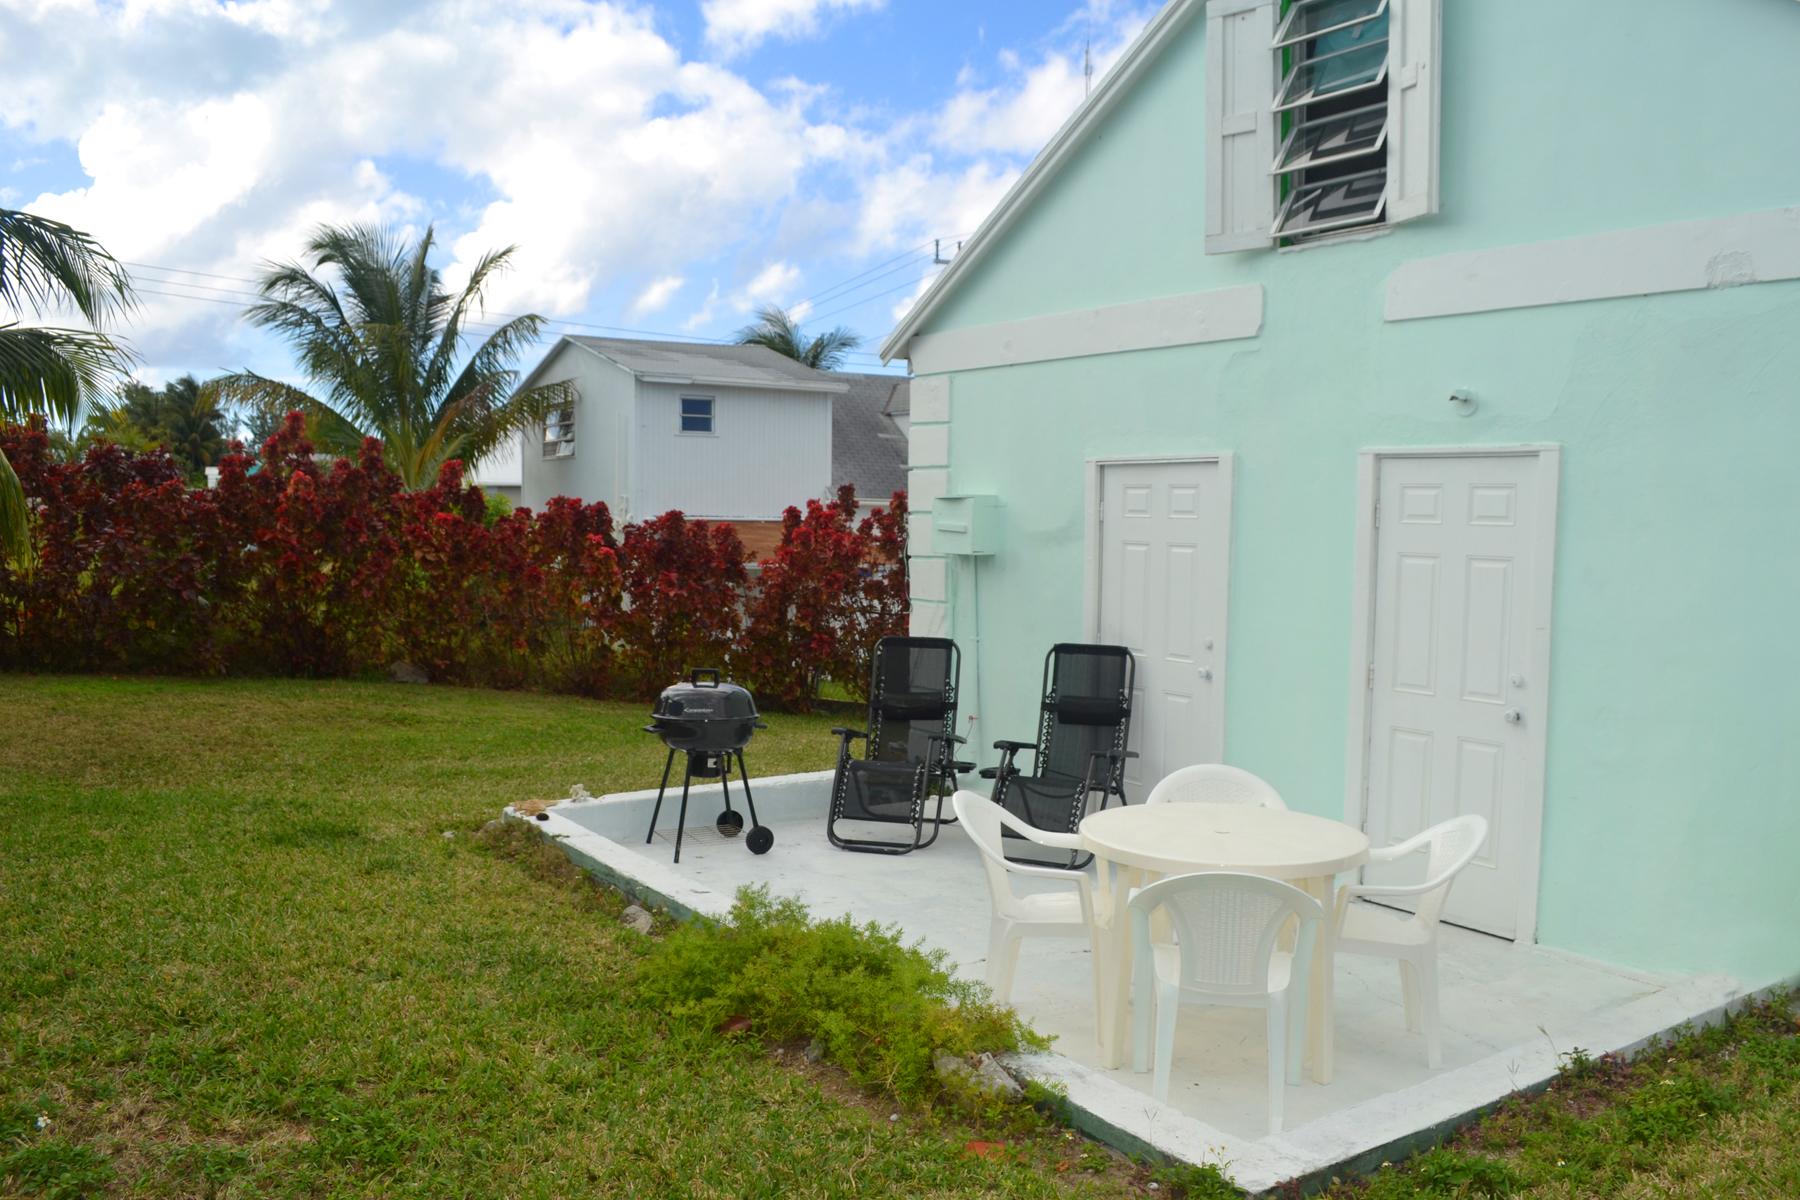 Additional photo for property listing at Sandpiper Cottage 西班牙维尔斯, 伊路瑟拉 巴哈马